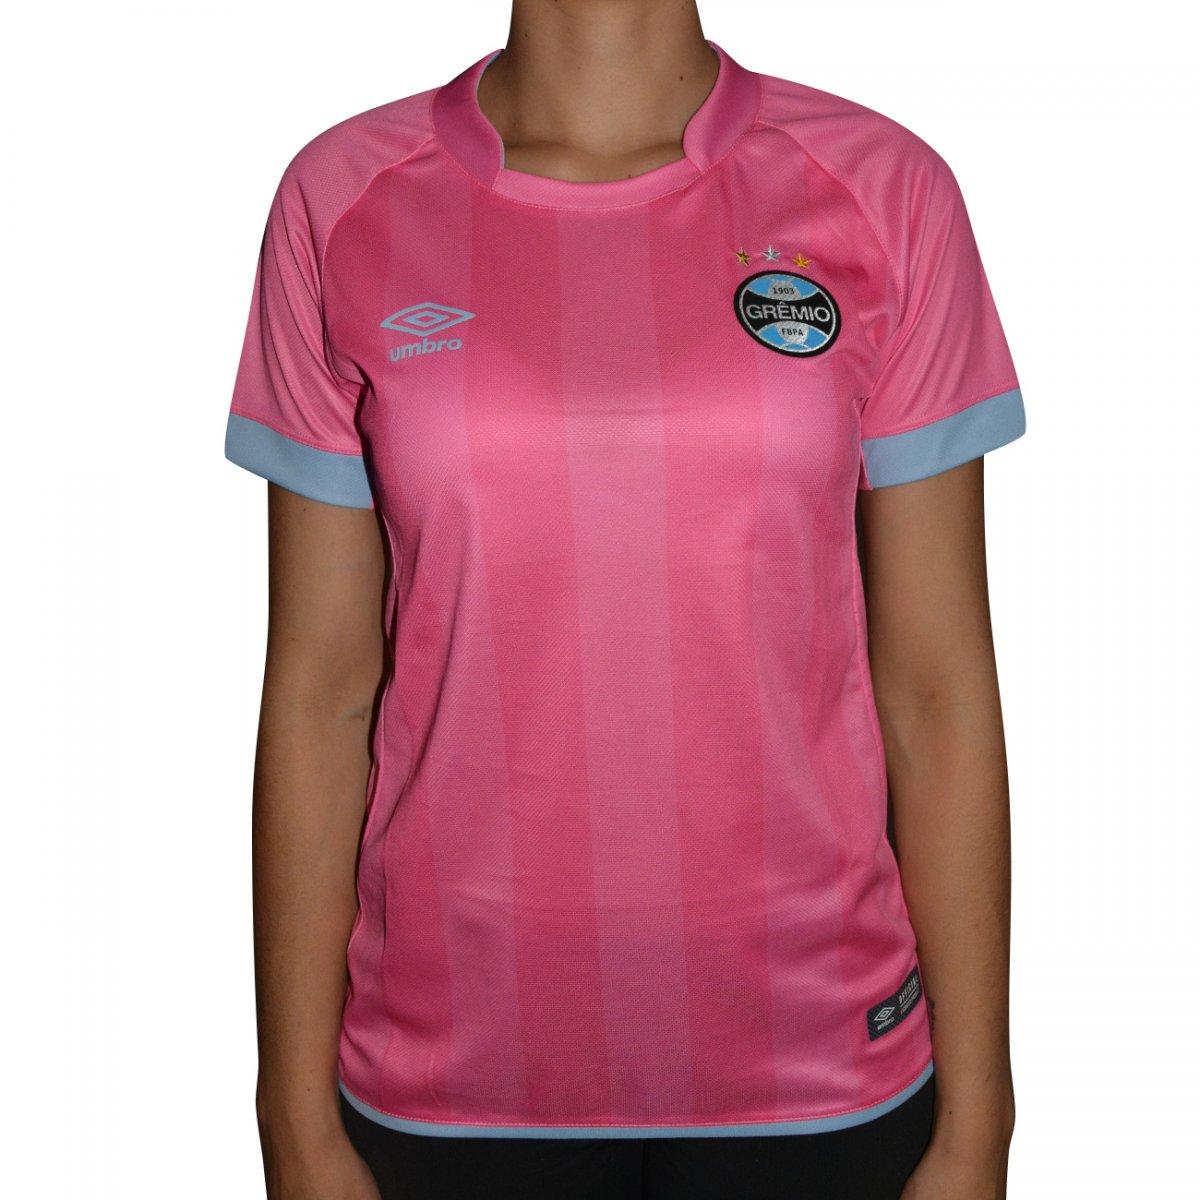 723d024914d00 comprar camiseta gremio original outubro rosa